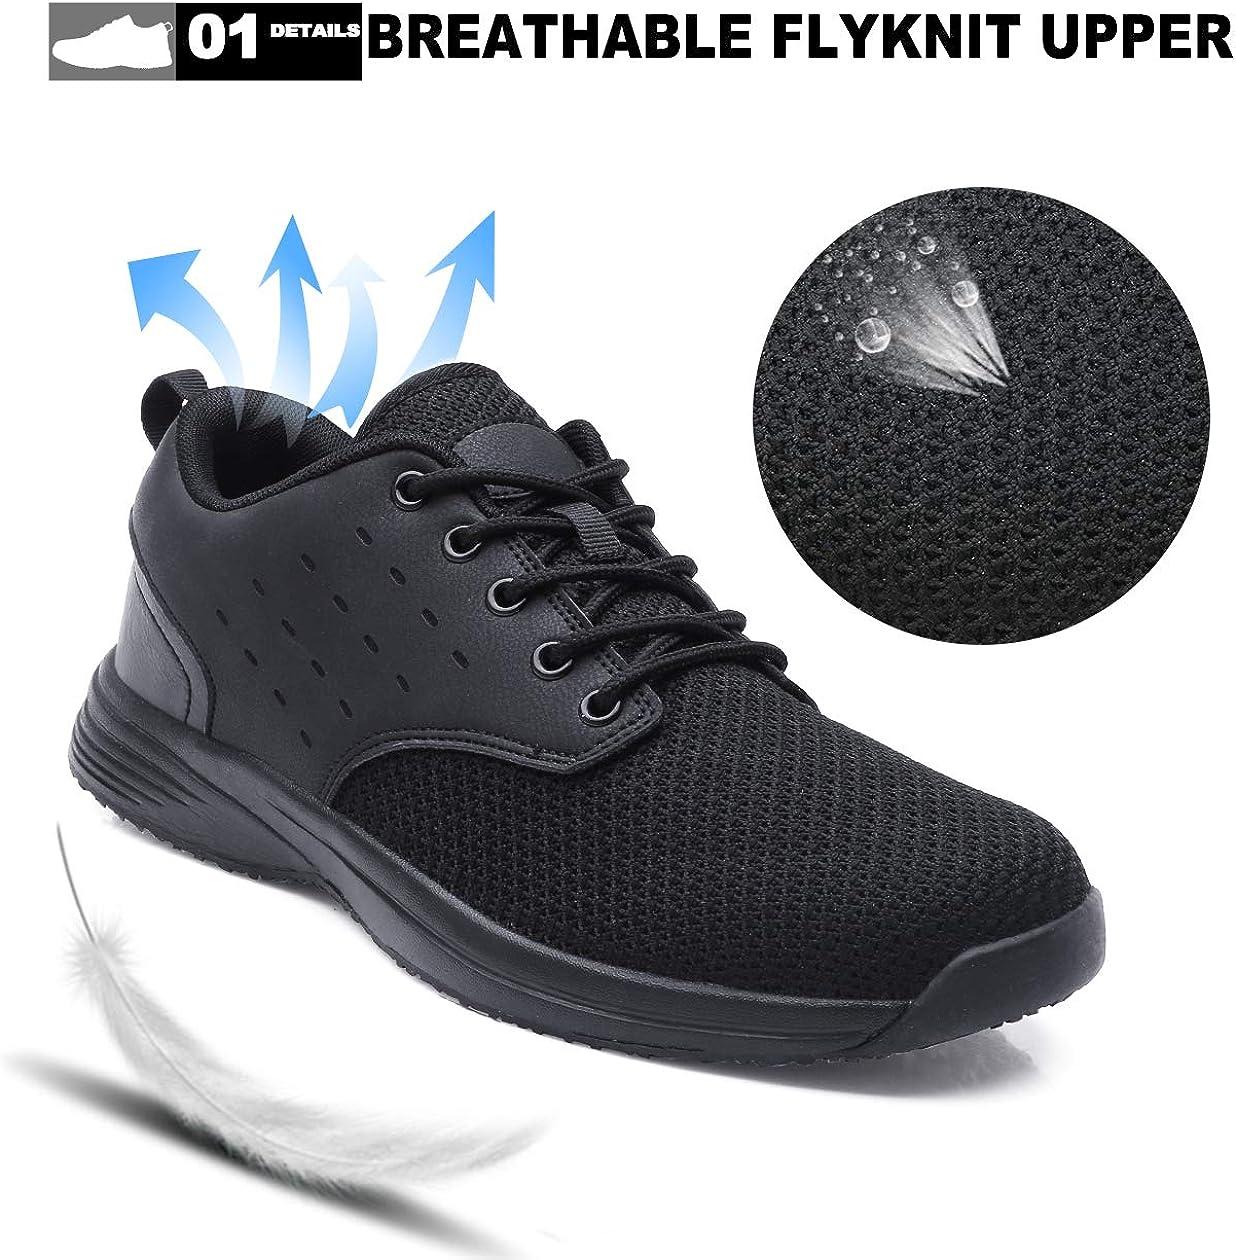 EXEBLUE Kitchen Shoes for Men Slip on Sneakers Slip Resistant Comfortable Lightweight Work Shoes Black: Shoes